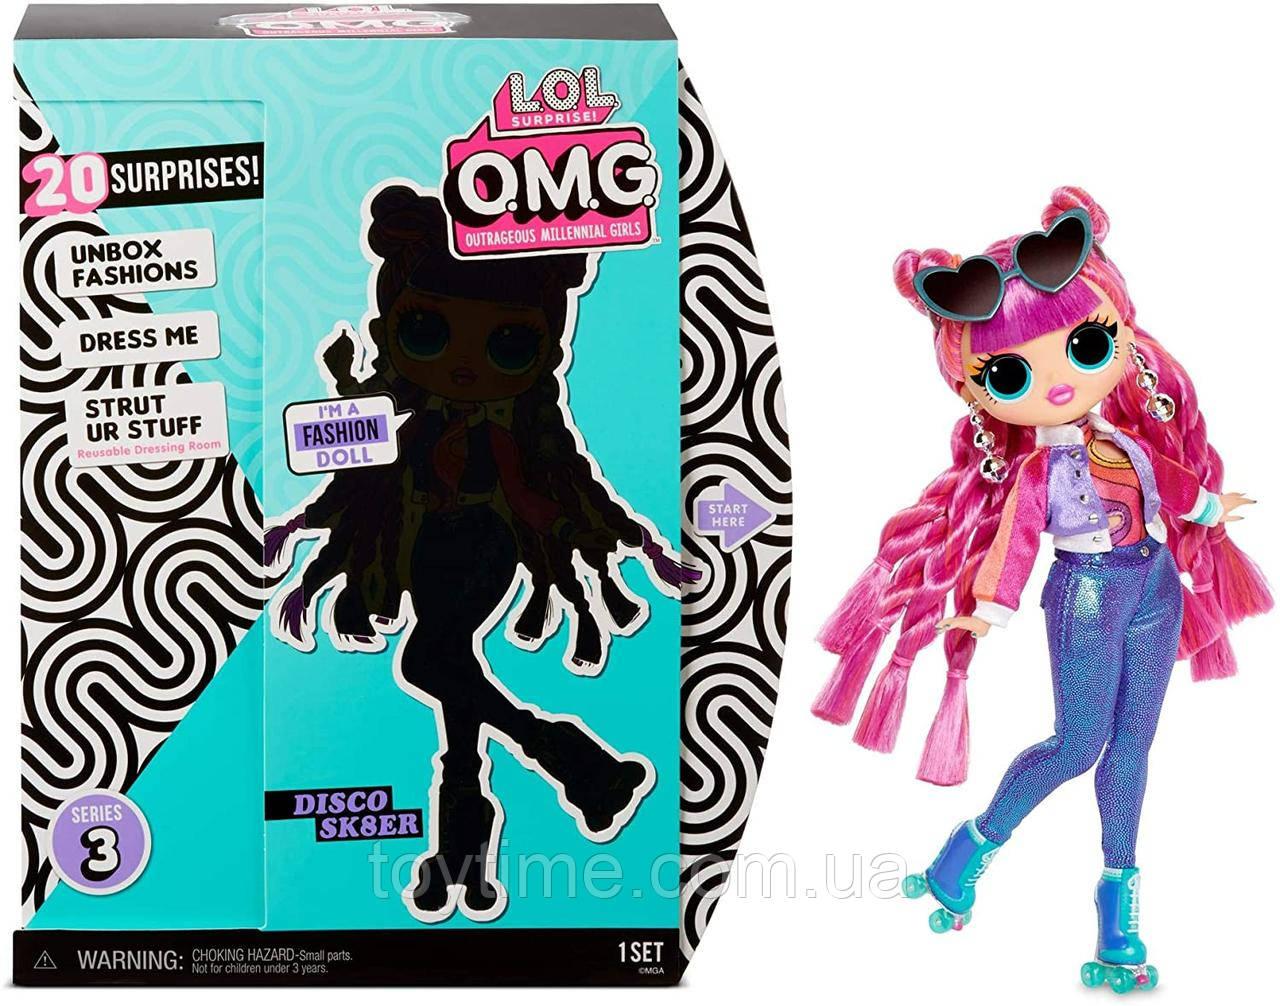 ЛОЛ серии O.M.G. S3 Диско-скейтер / L.O.L. Surprise! O.M.G. Series 3 Roller Chick